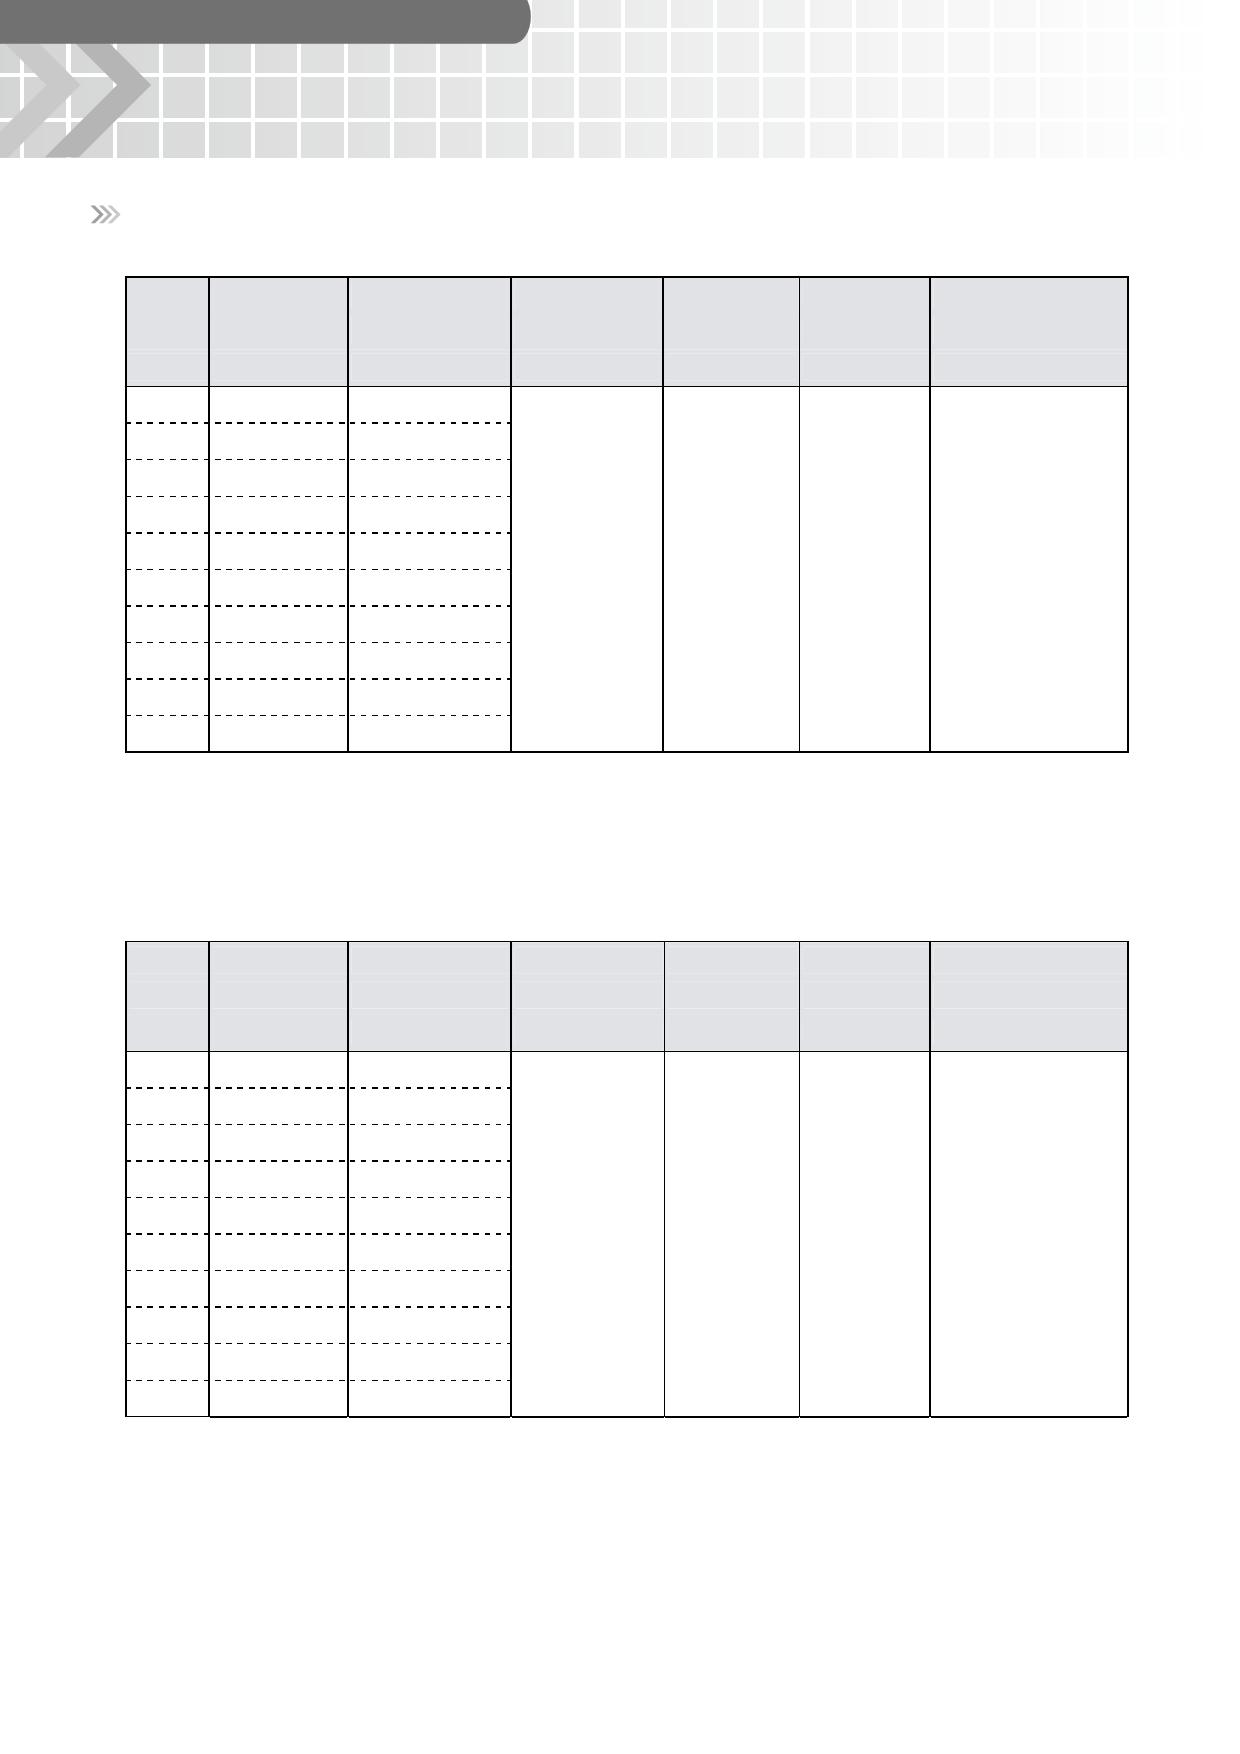 894-2AC1-F-V pdf, ピン配列